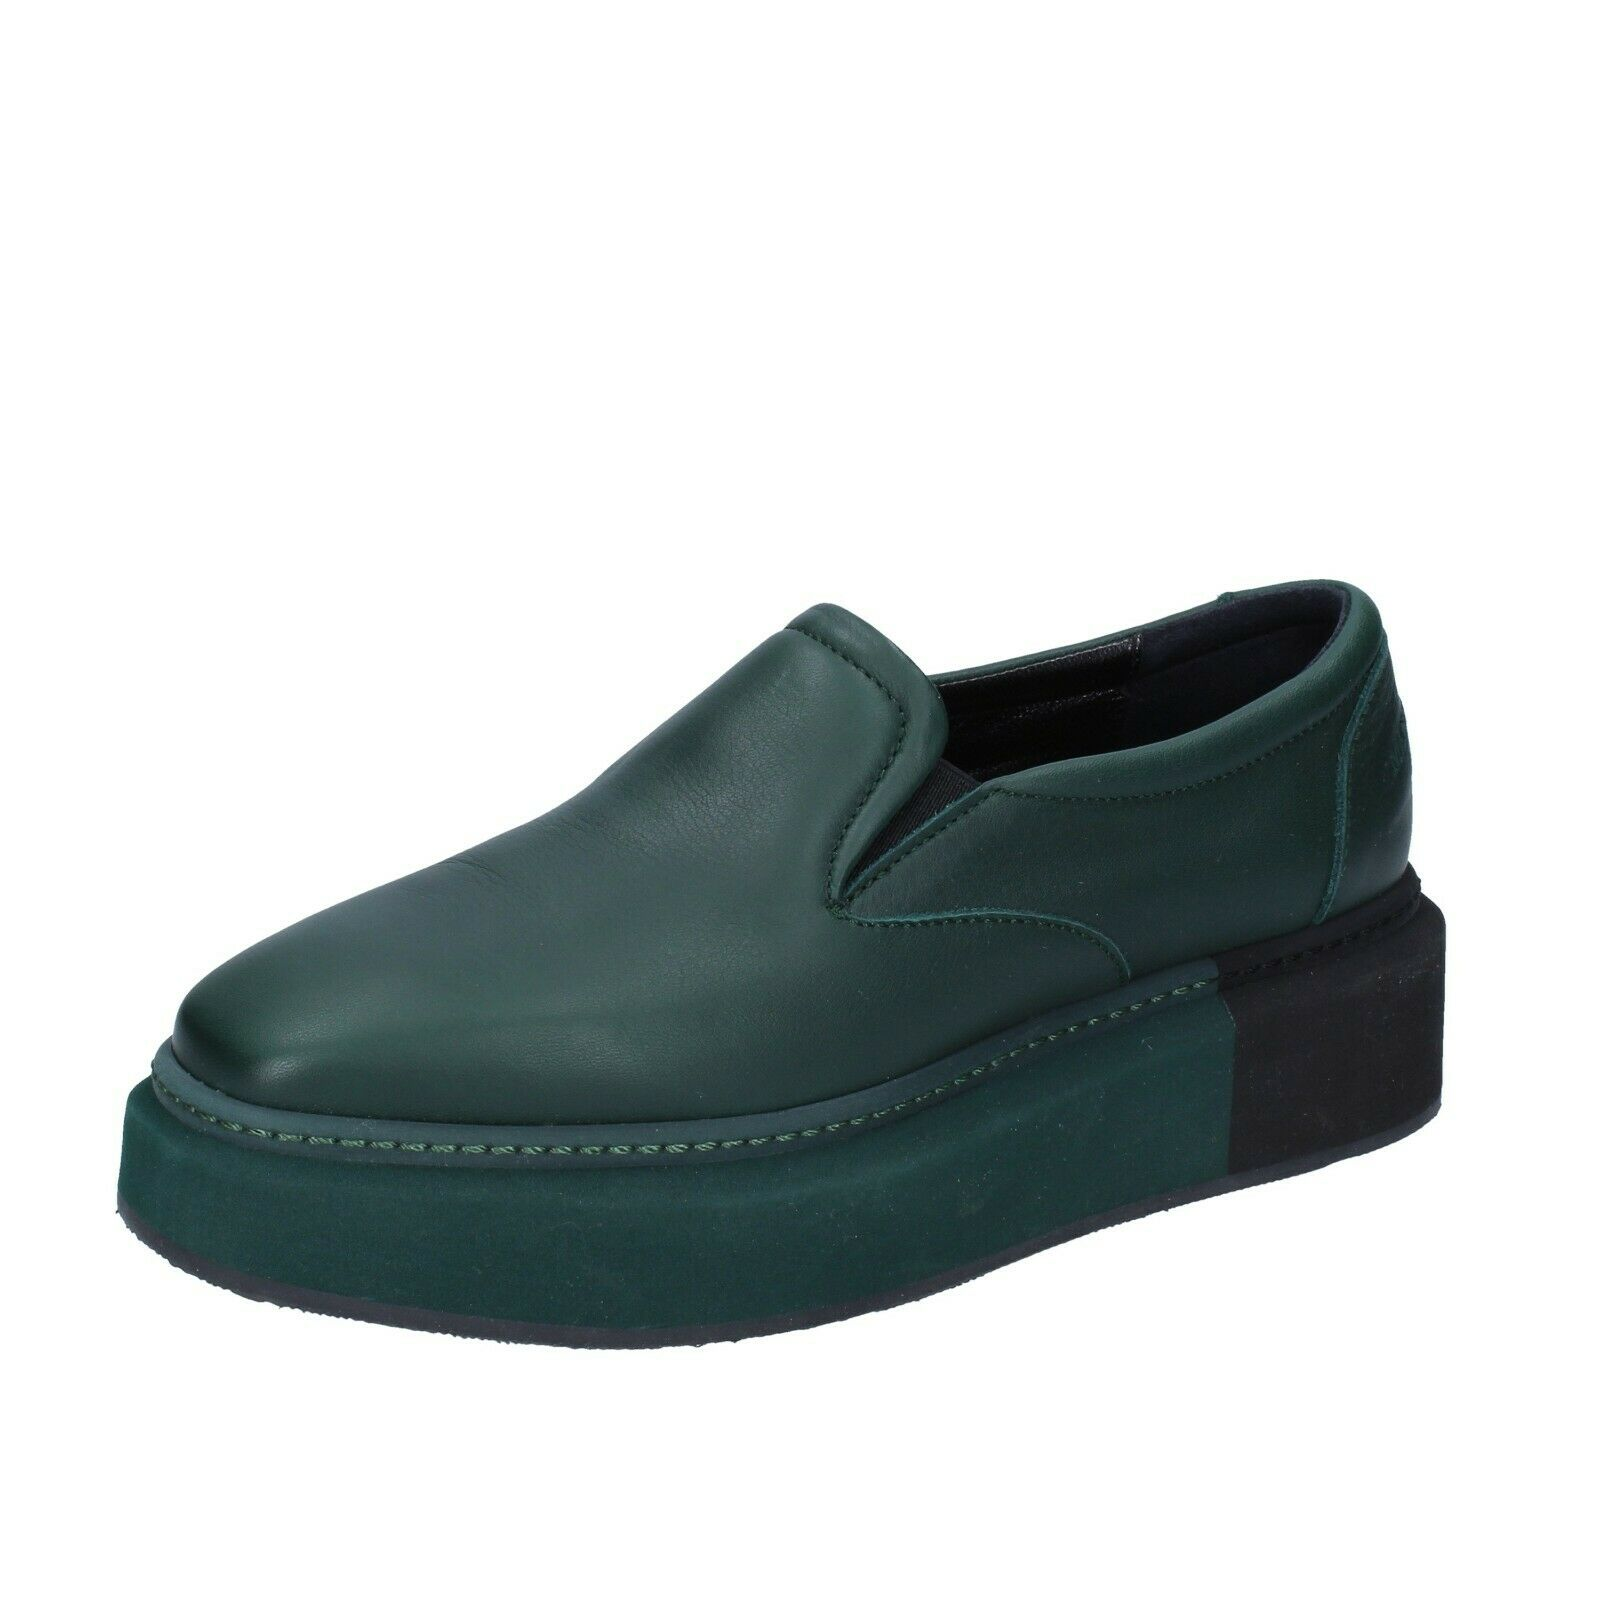 Chaussures Femmes Manuel Barcelo 6 (UE 36) Baskets en Cuir Vert BS333-36